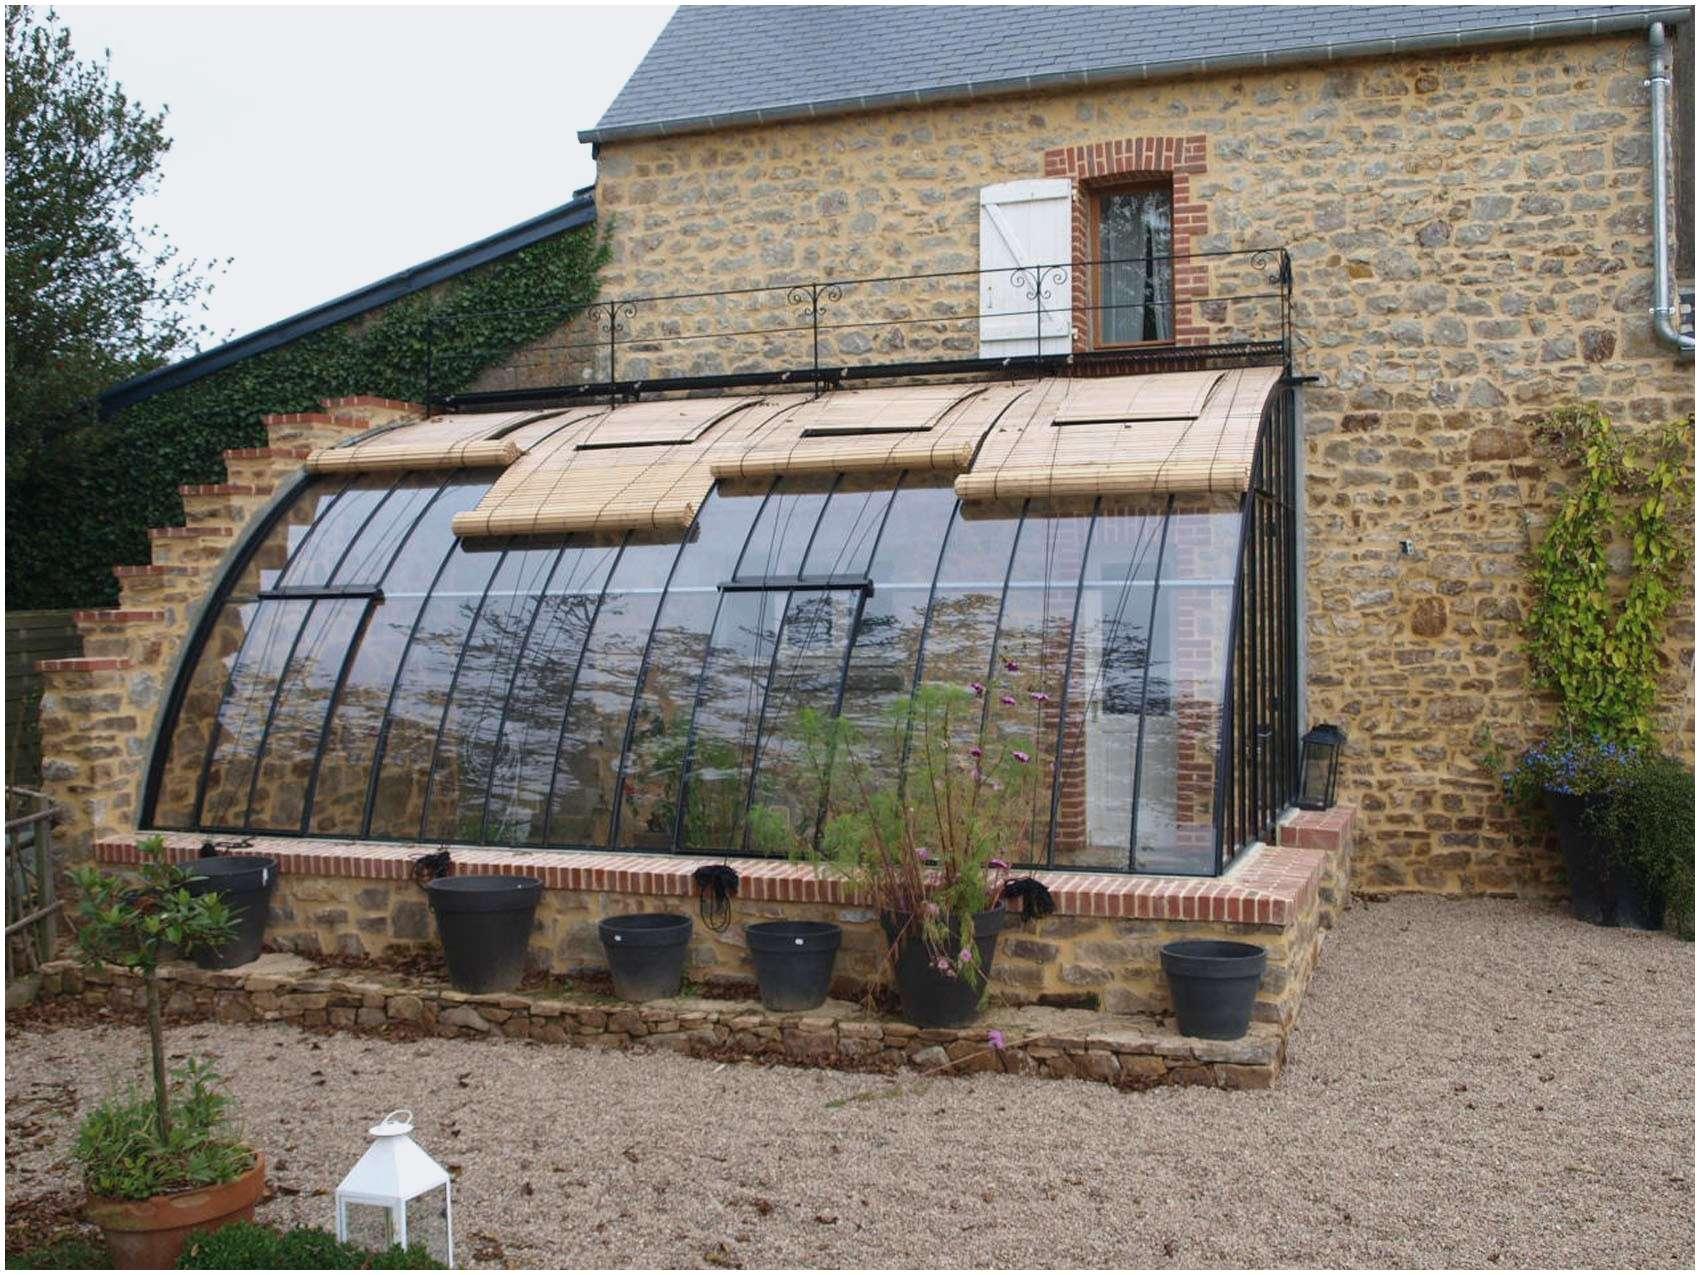 Arceau Jardin Leroy Merlin – Gamboahinestrosa avec Arche De Jardin Leroy Merlin